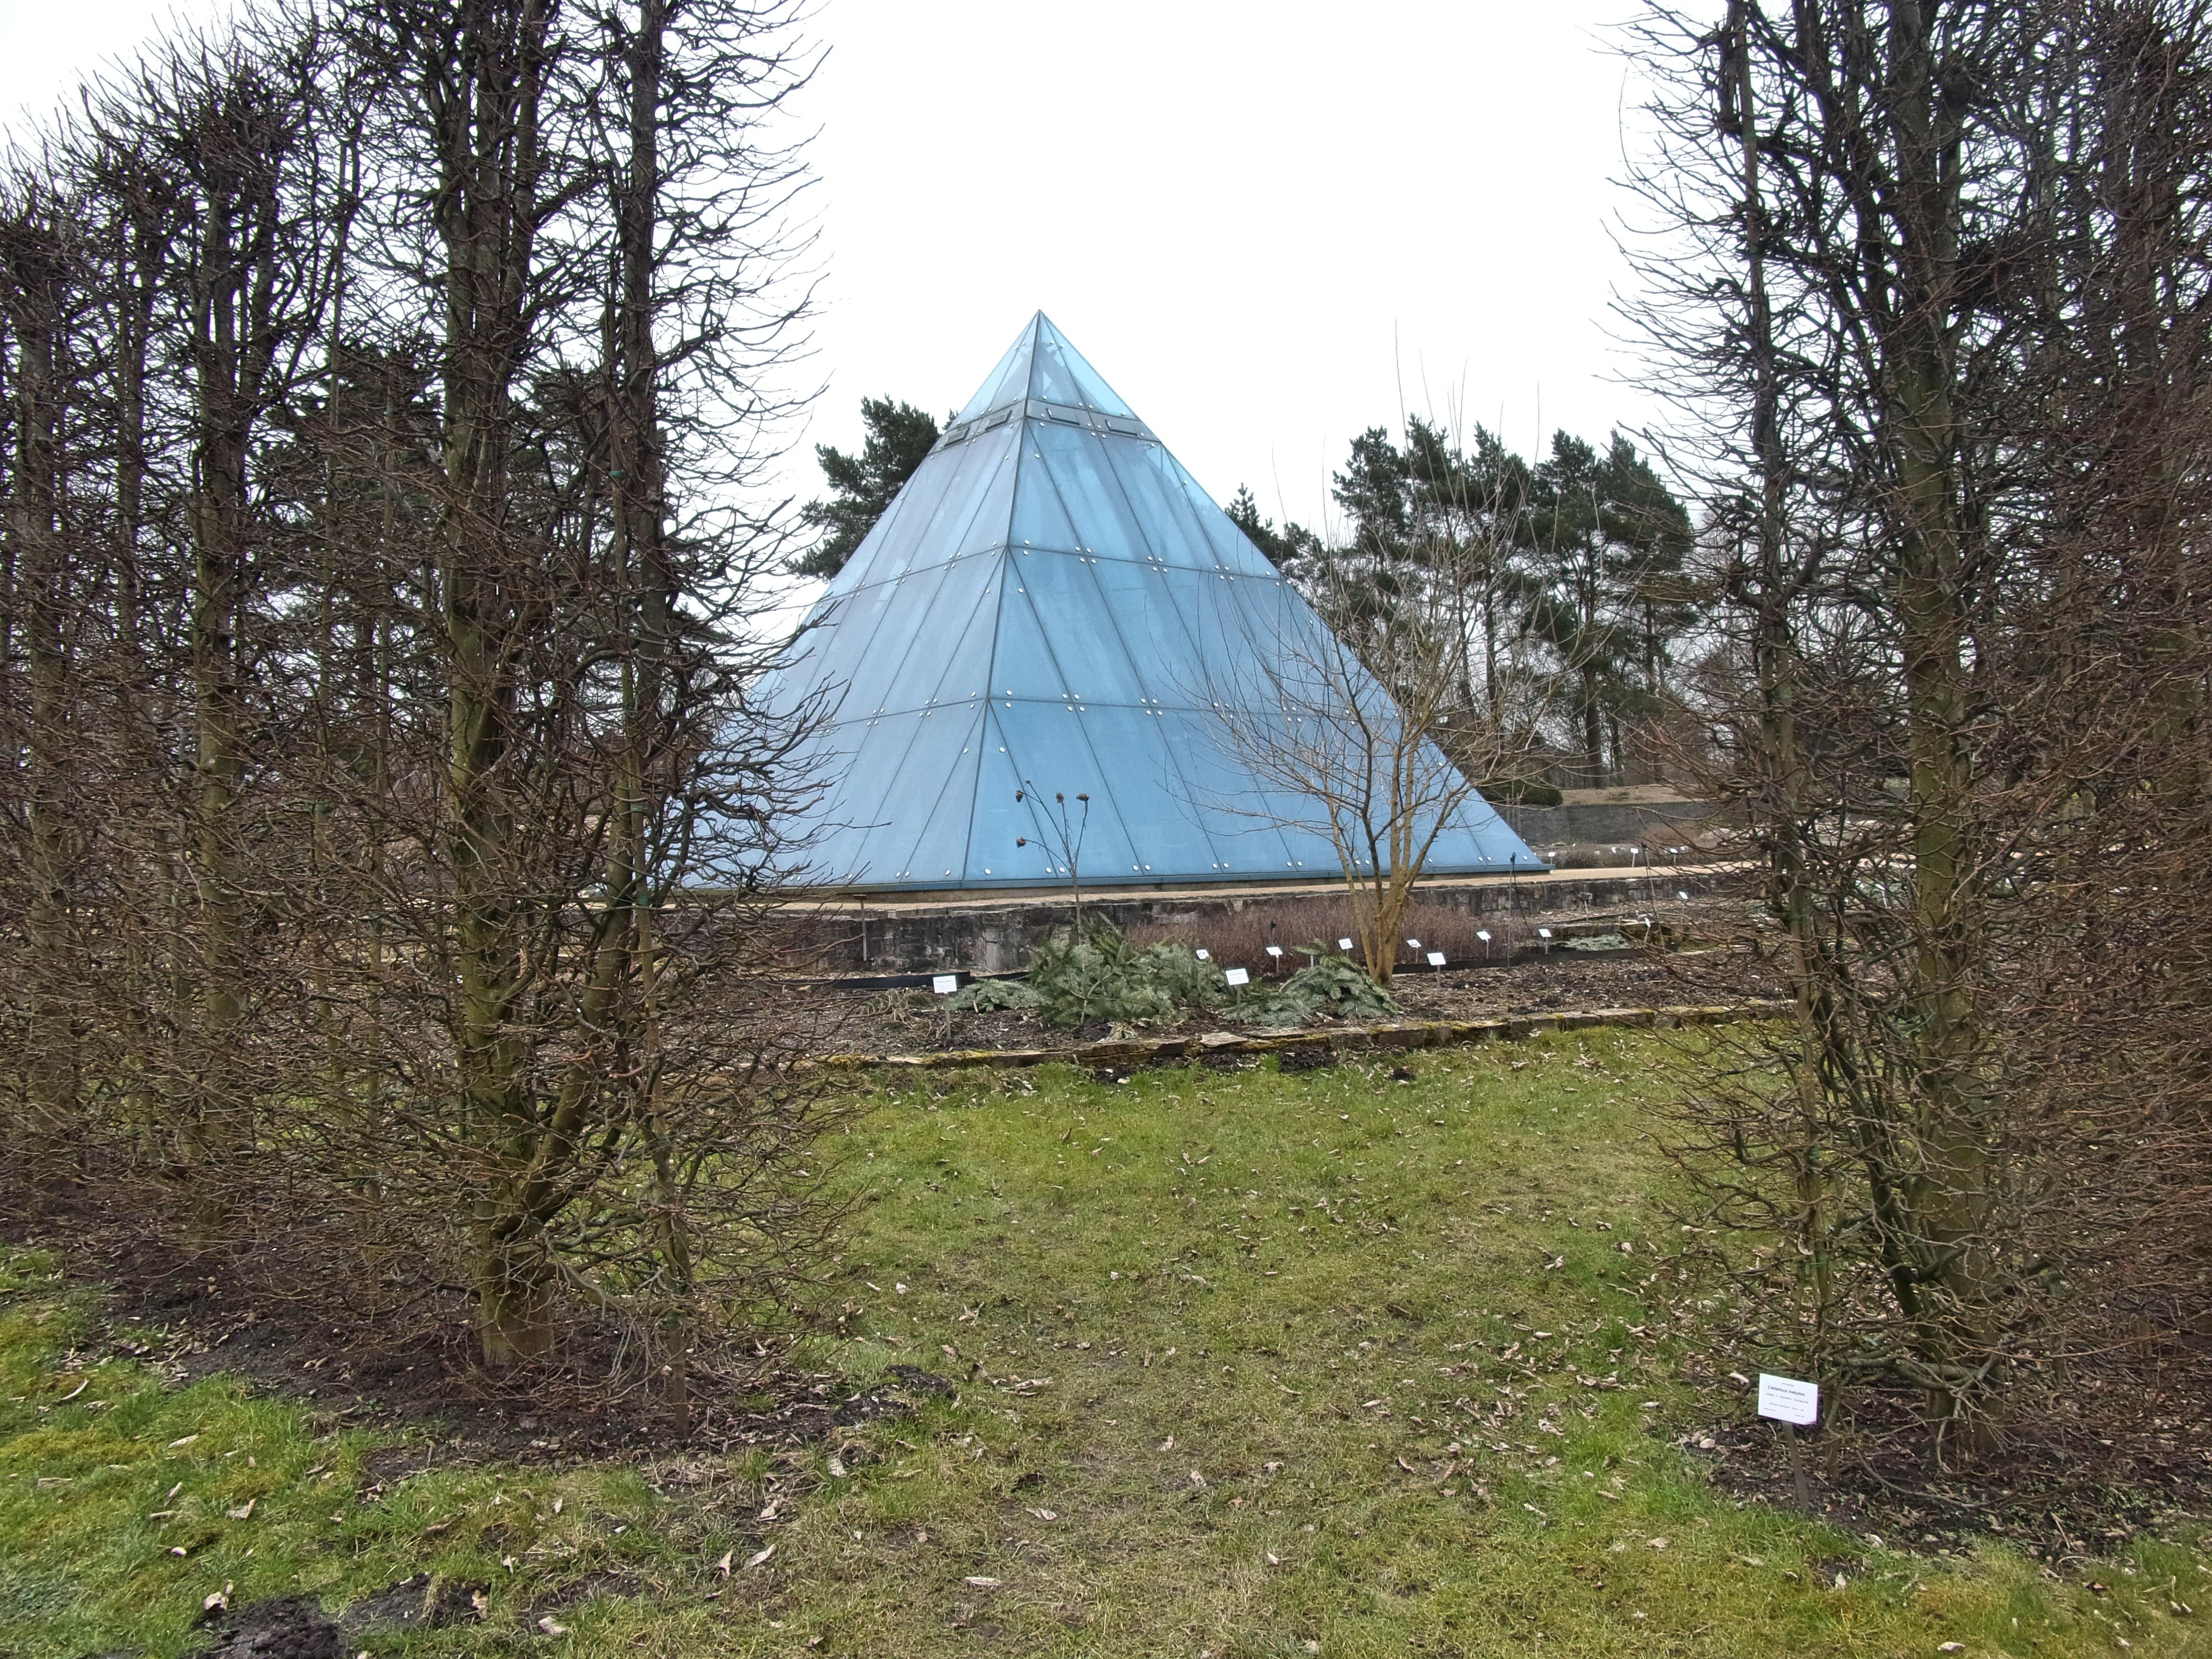 Fileloki Schmidt Garten Hh Pyramiden Wüstengartenjpg Wikimedia